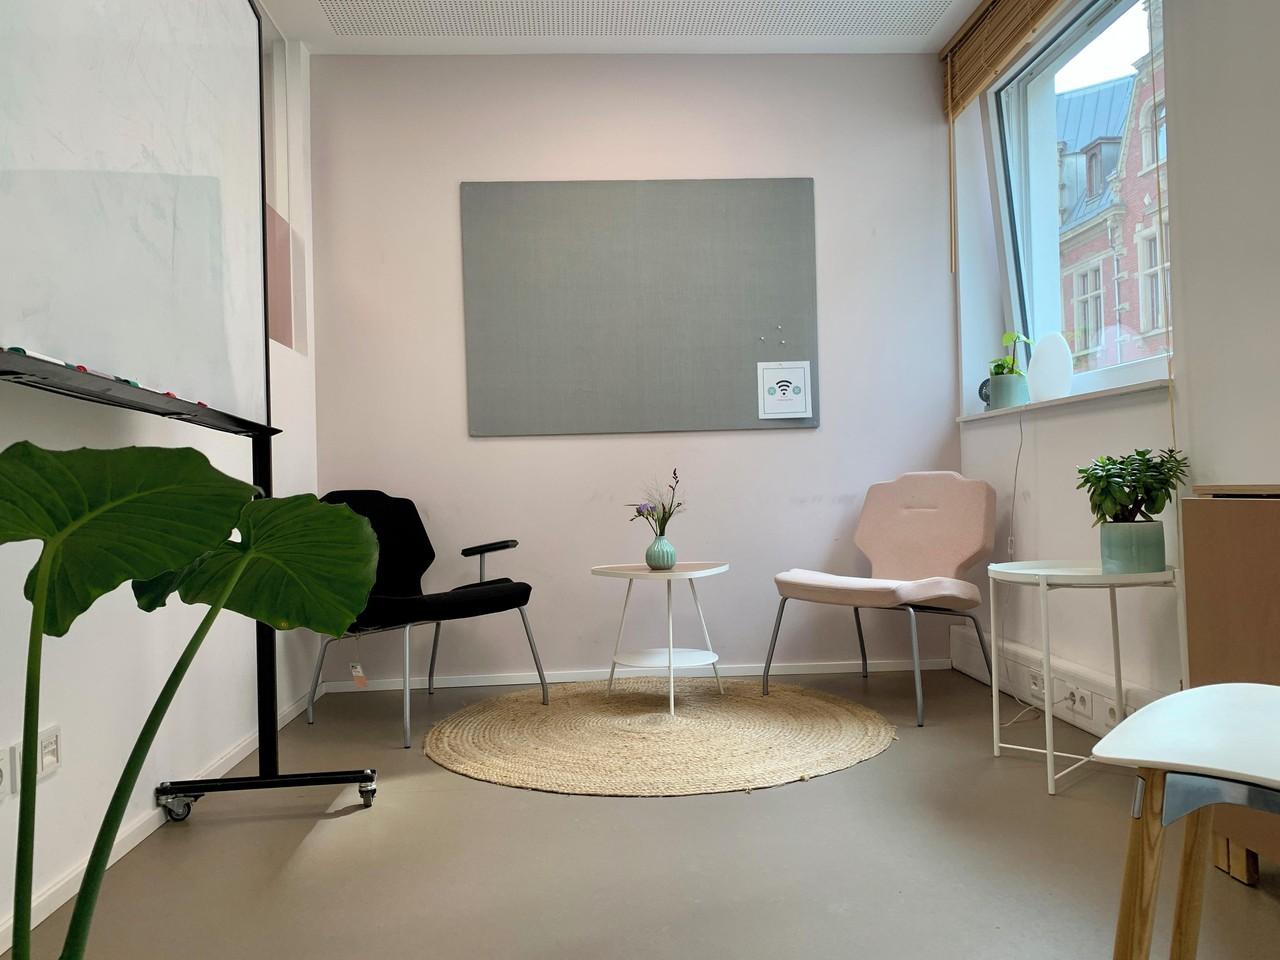 Cologne workshop spaces Coworking space Coachingraum image 0